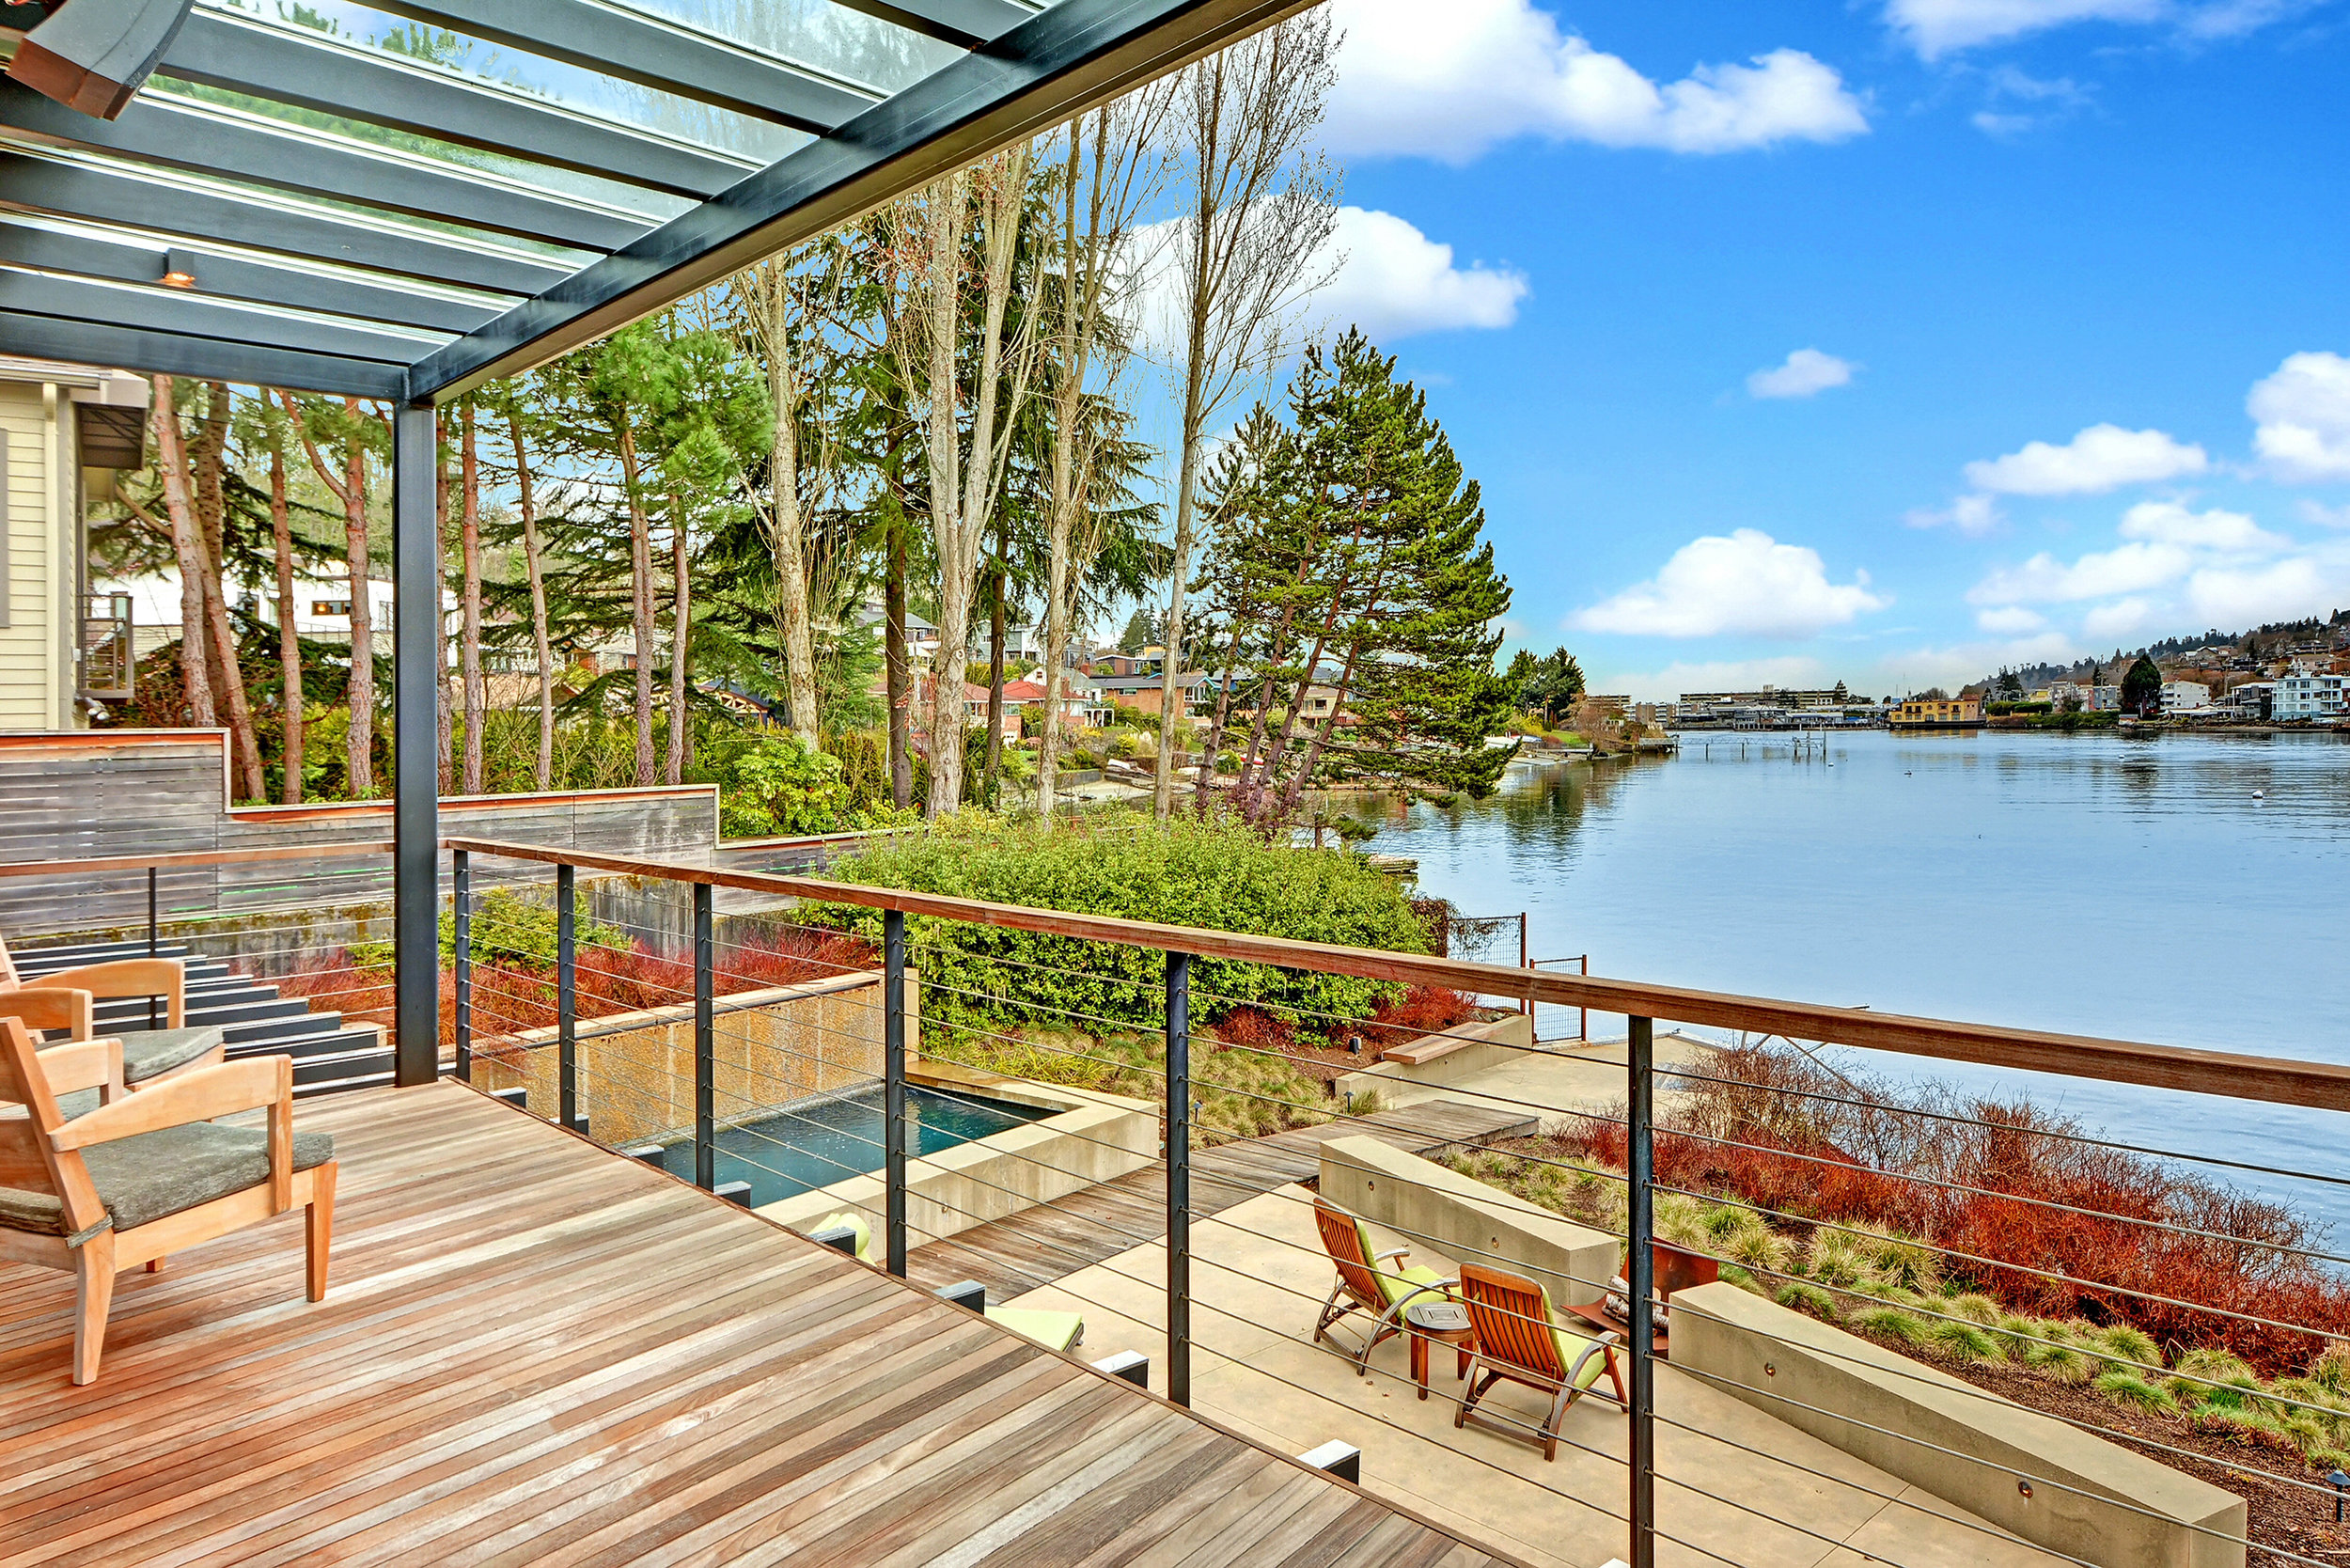 Landscape and shoreline west of Hiram Chittenden Locks in Seattle